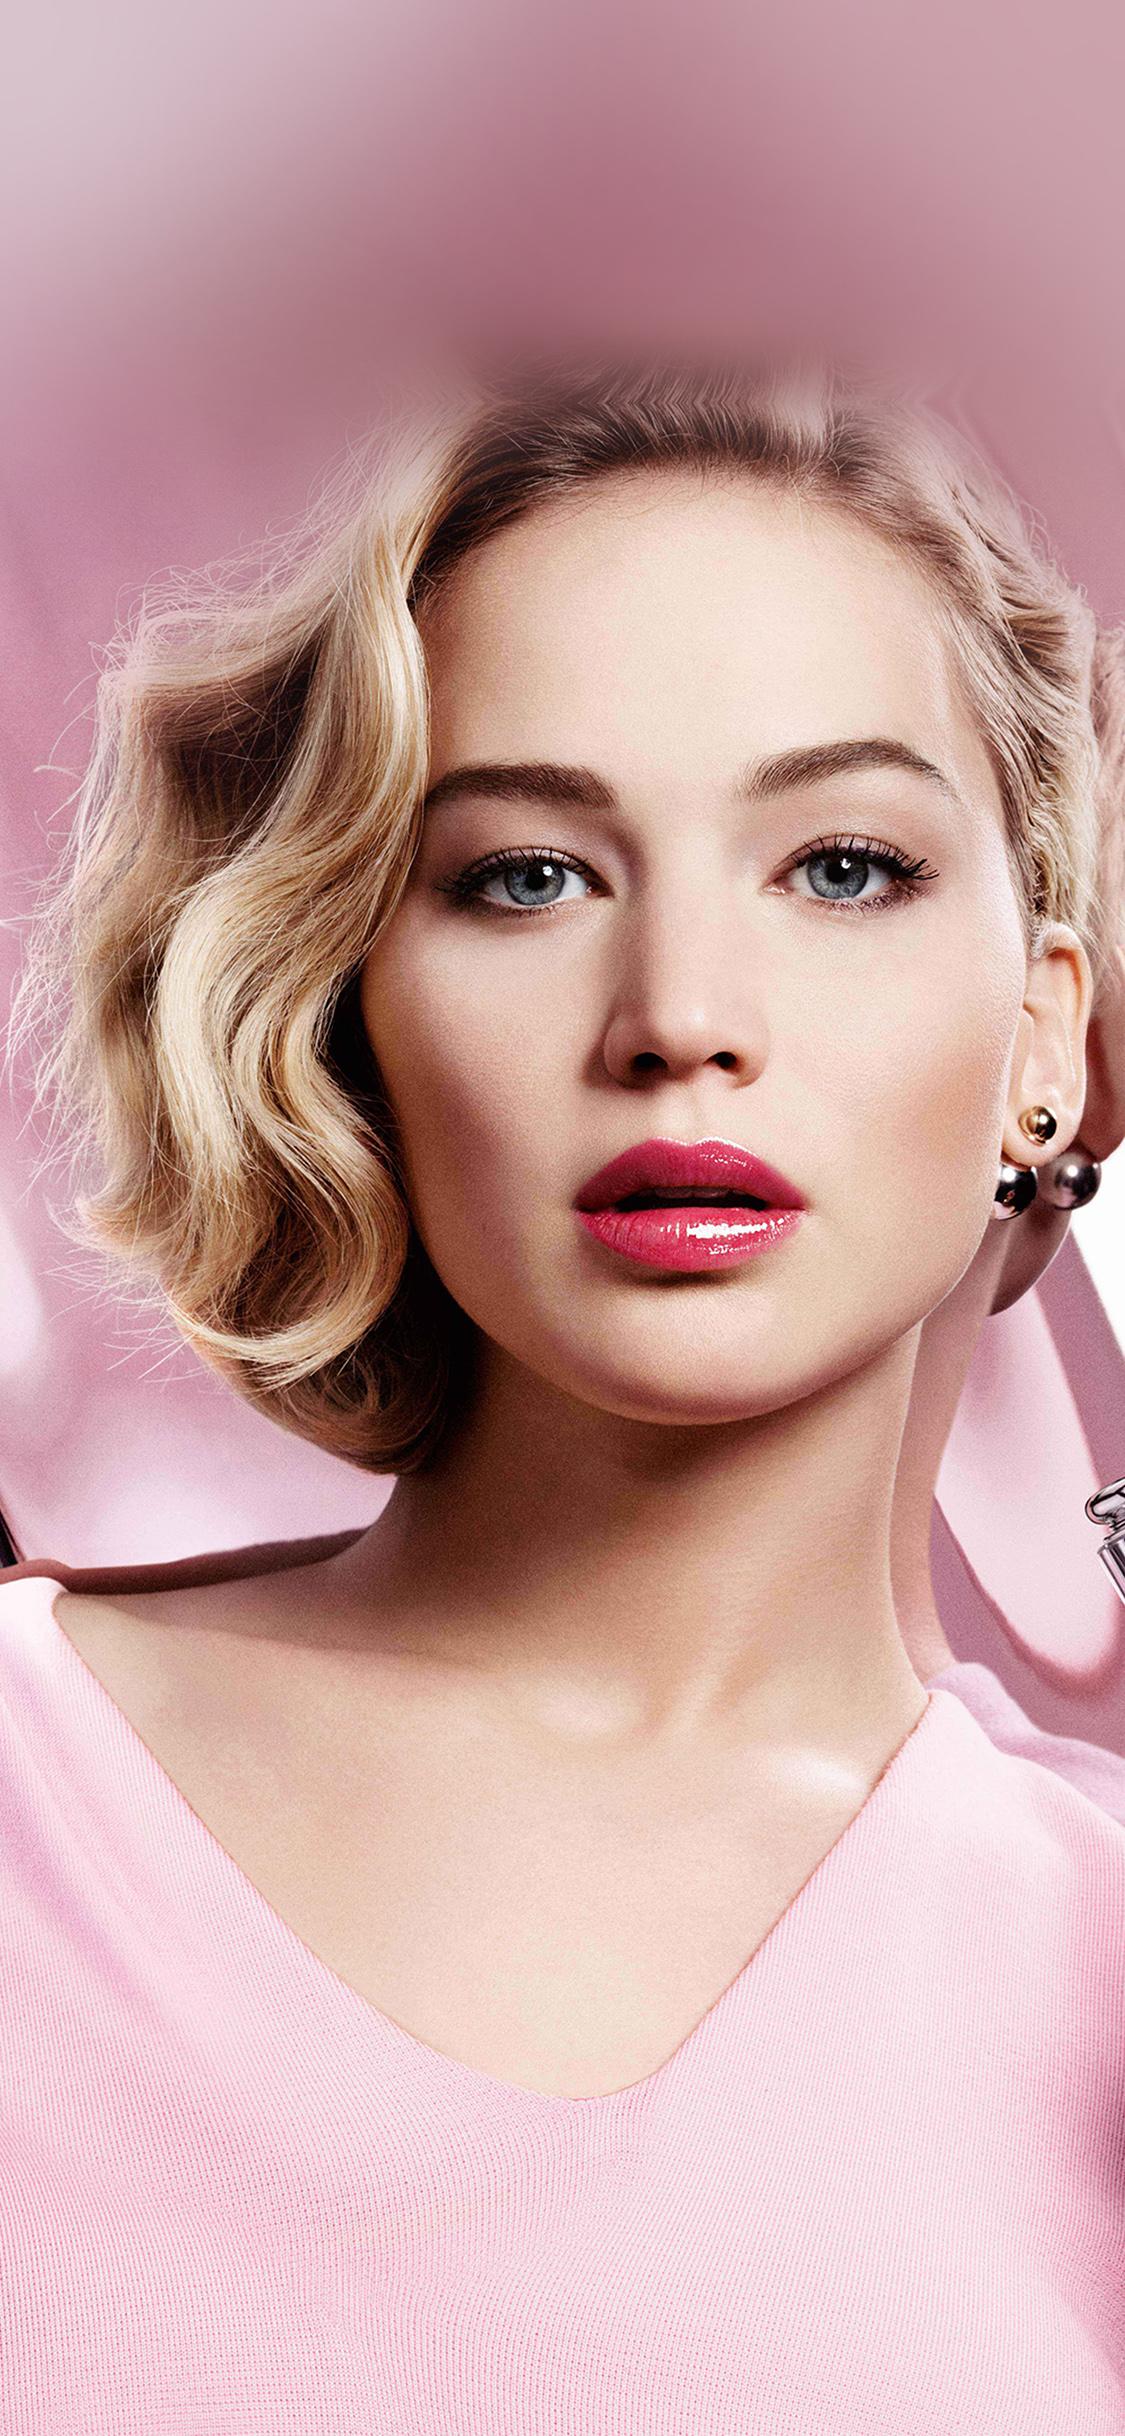 iPhoneXpapers.com-Apple-iPhone-wallpaper-hl83-jennifer-lawrence-pink-model-celebrity-lips